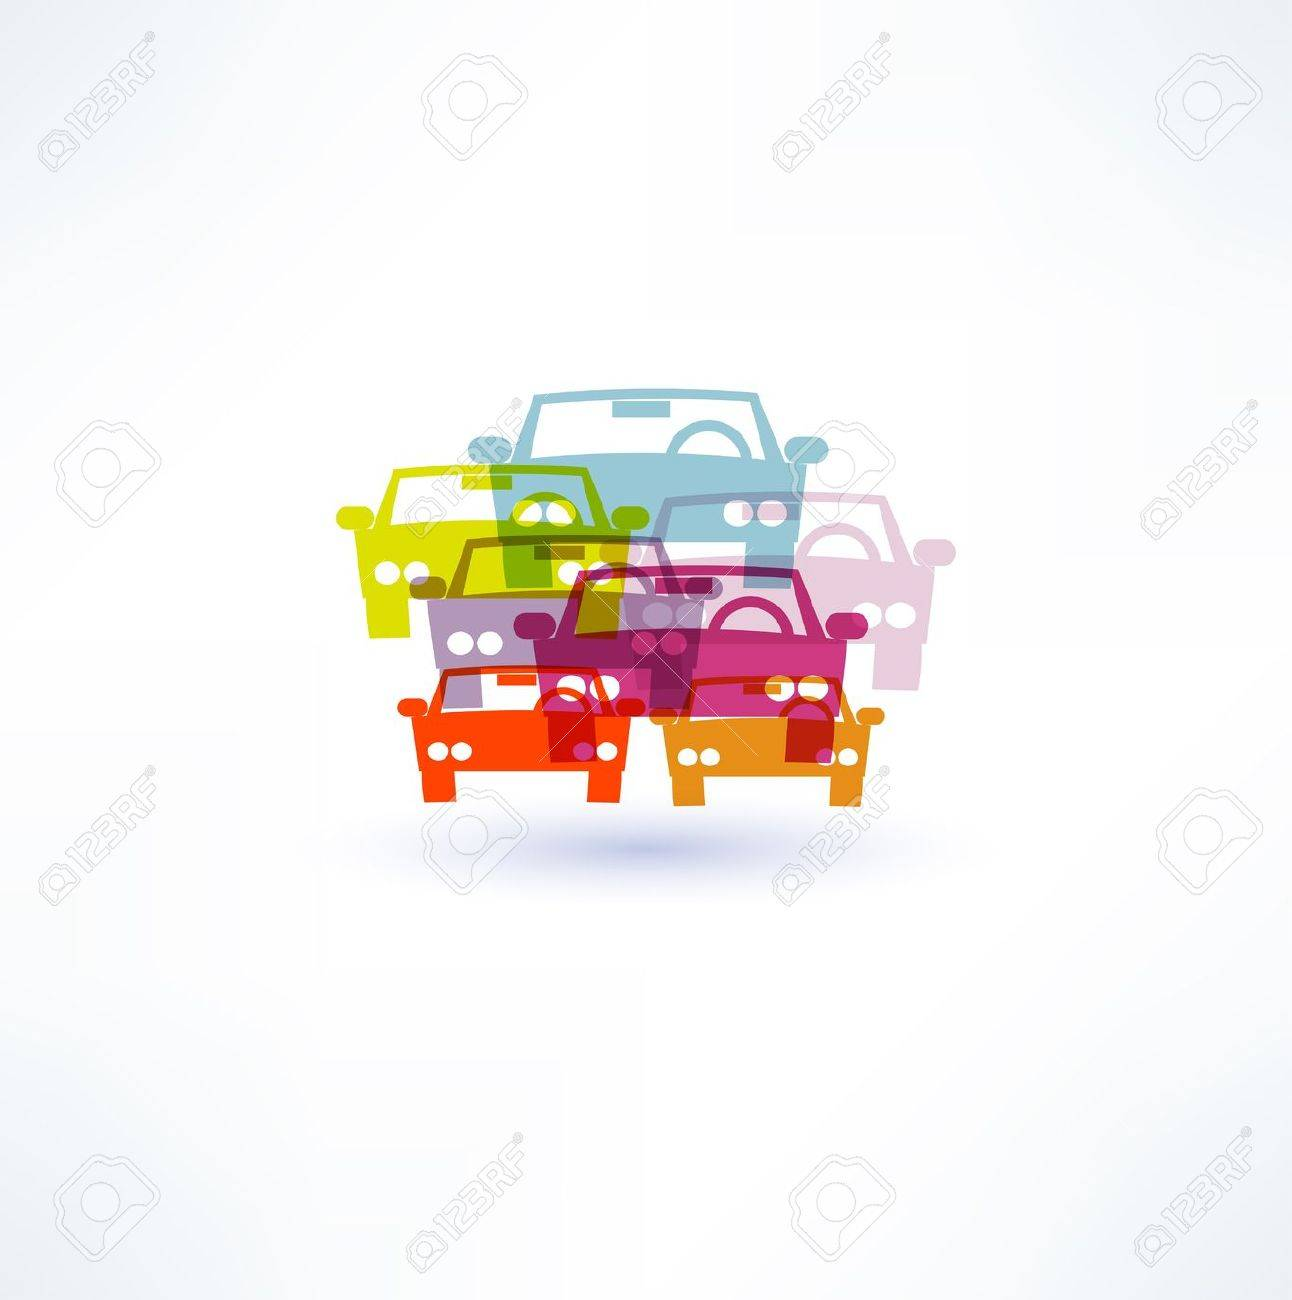 Car icon - 15567722